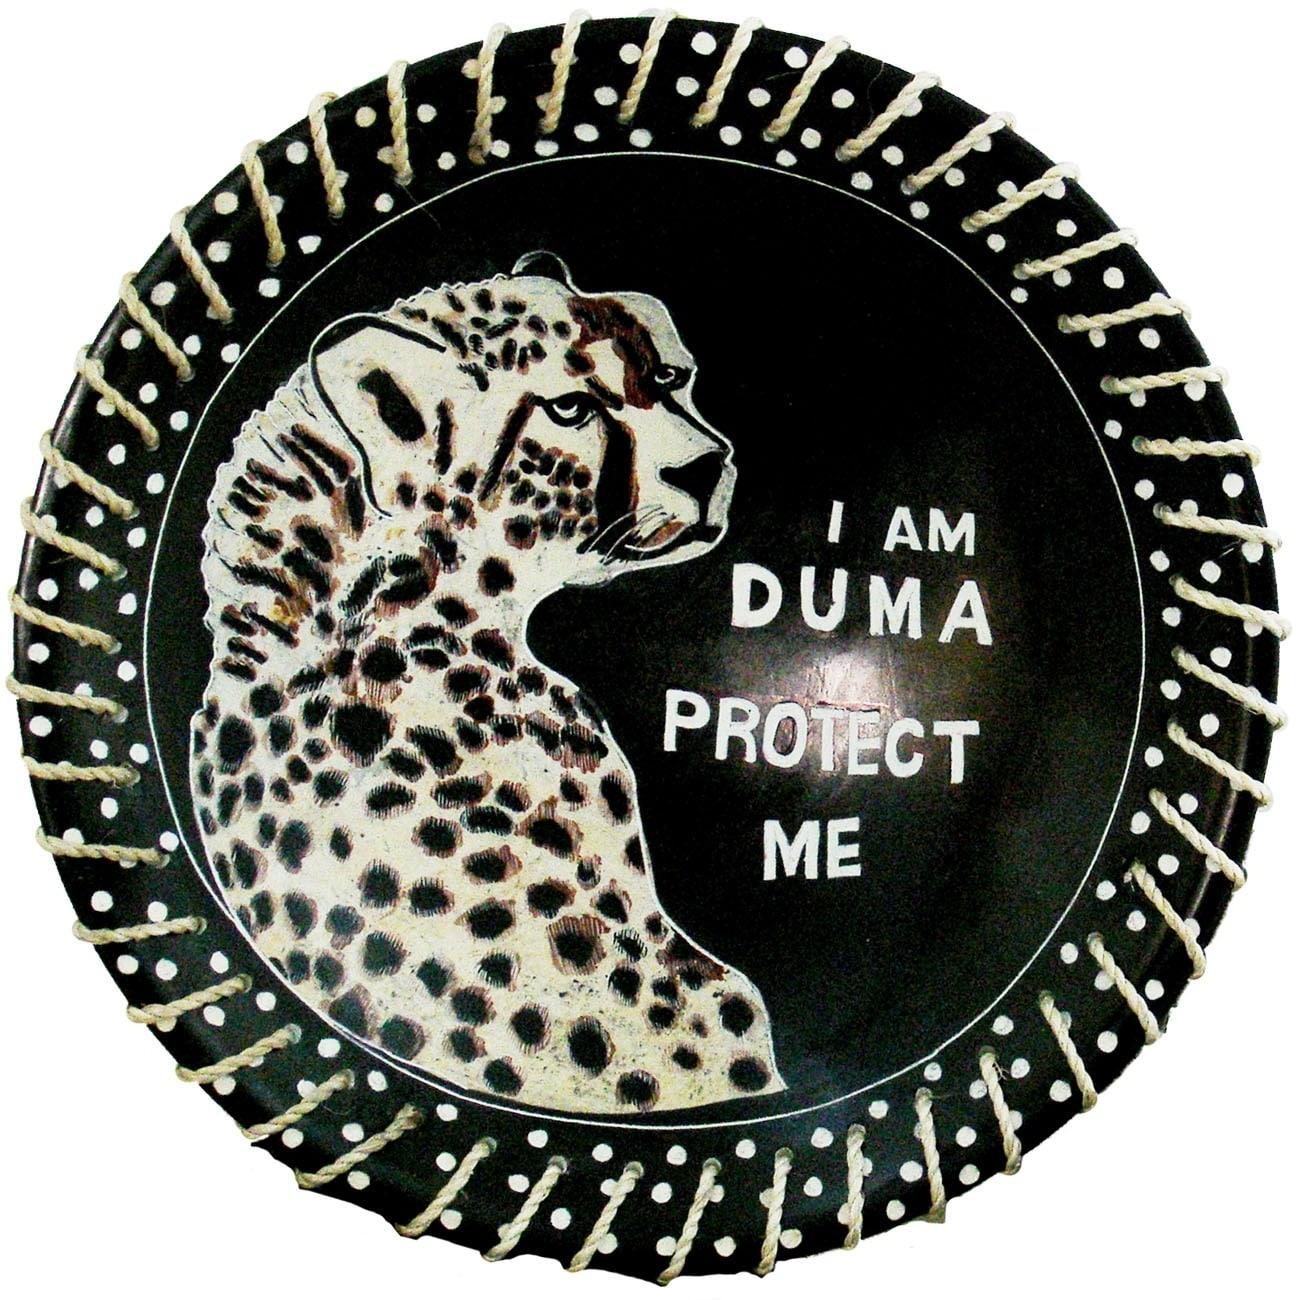 Protect Me Kisii Soapstone Decorative Cheetah Plate with Native Sisal Rope, 8